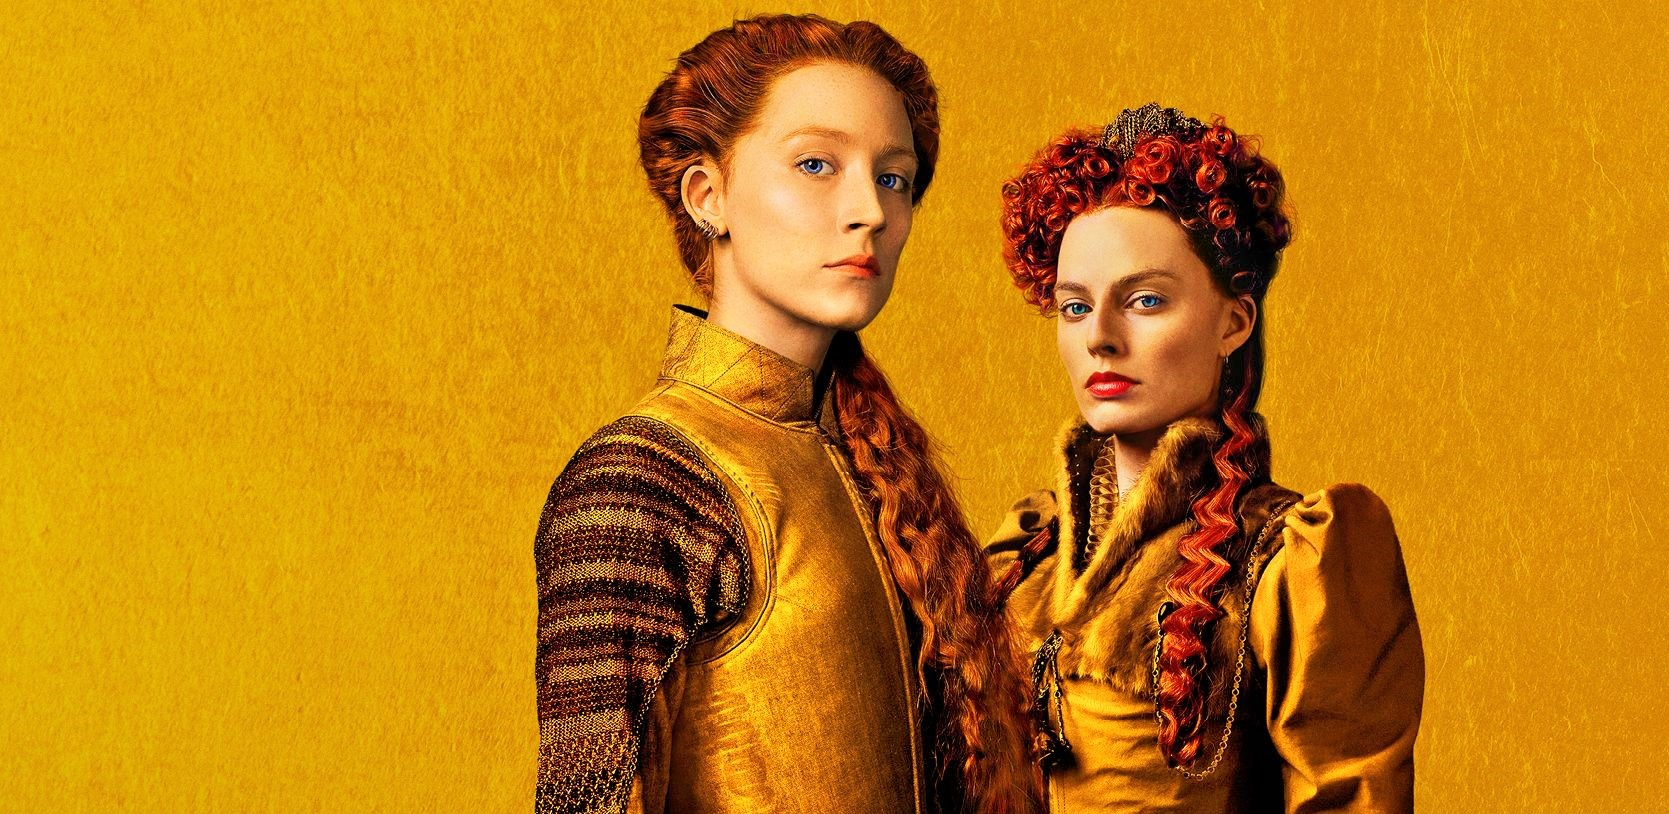 Марго Робби и Сирша Ронан на постерах «Двух королев»